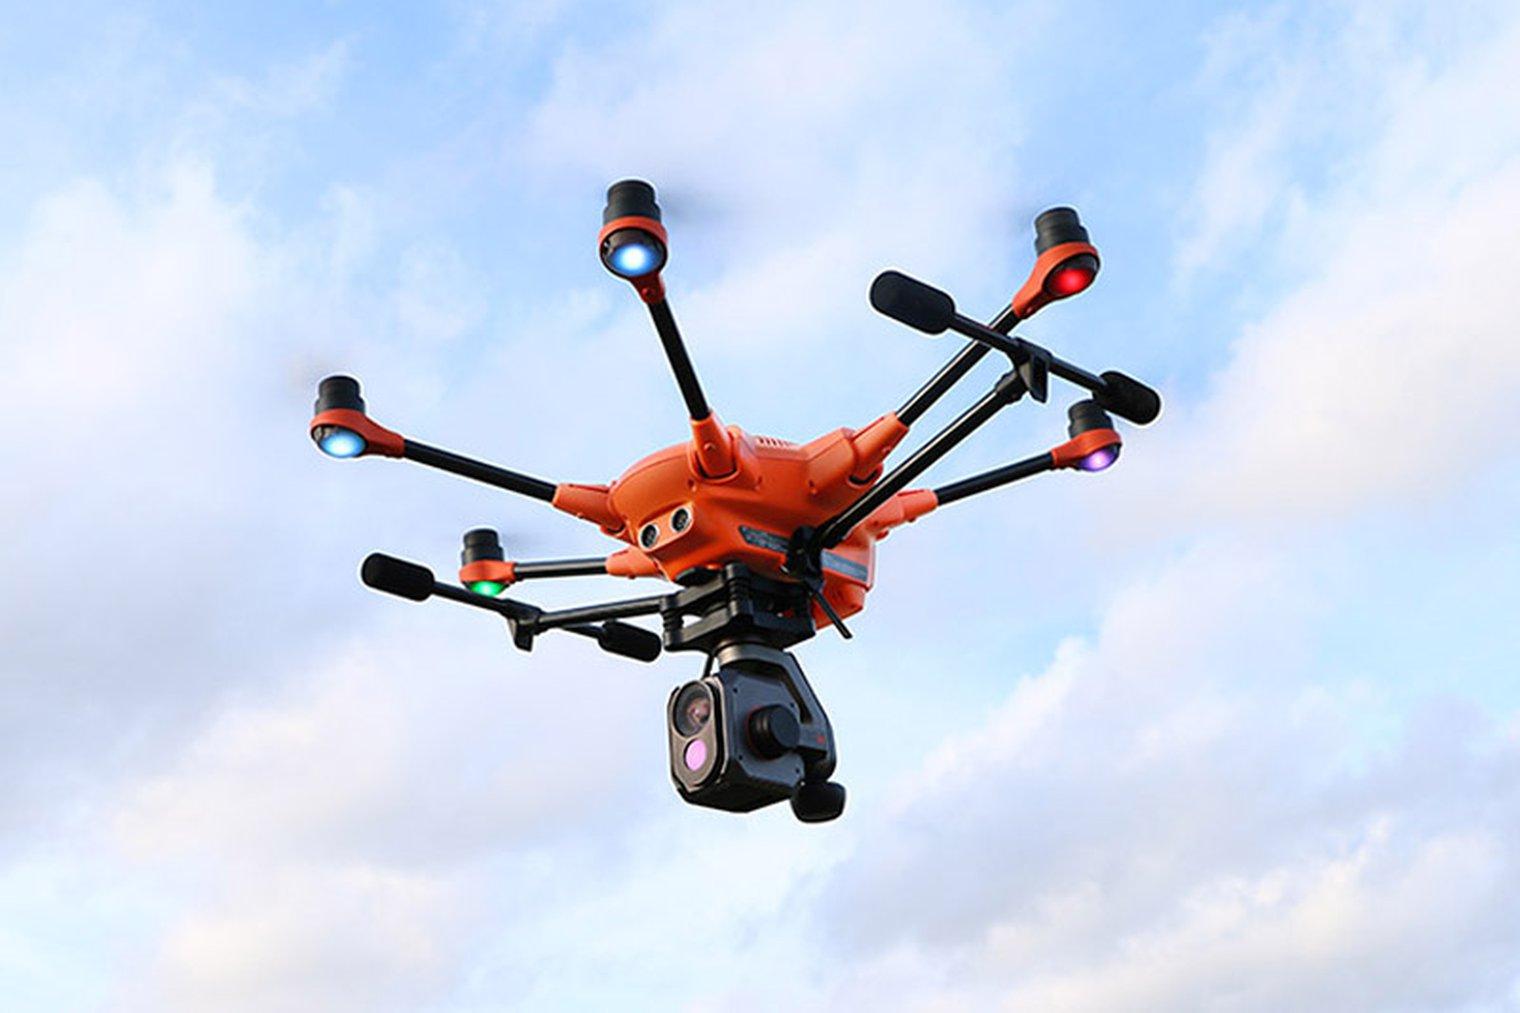 Yuneec, Mobilicom team for advanced UAS - Unmanned ...